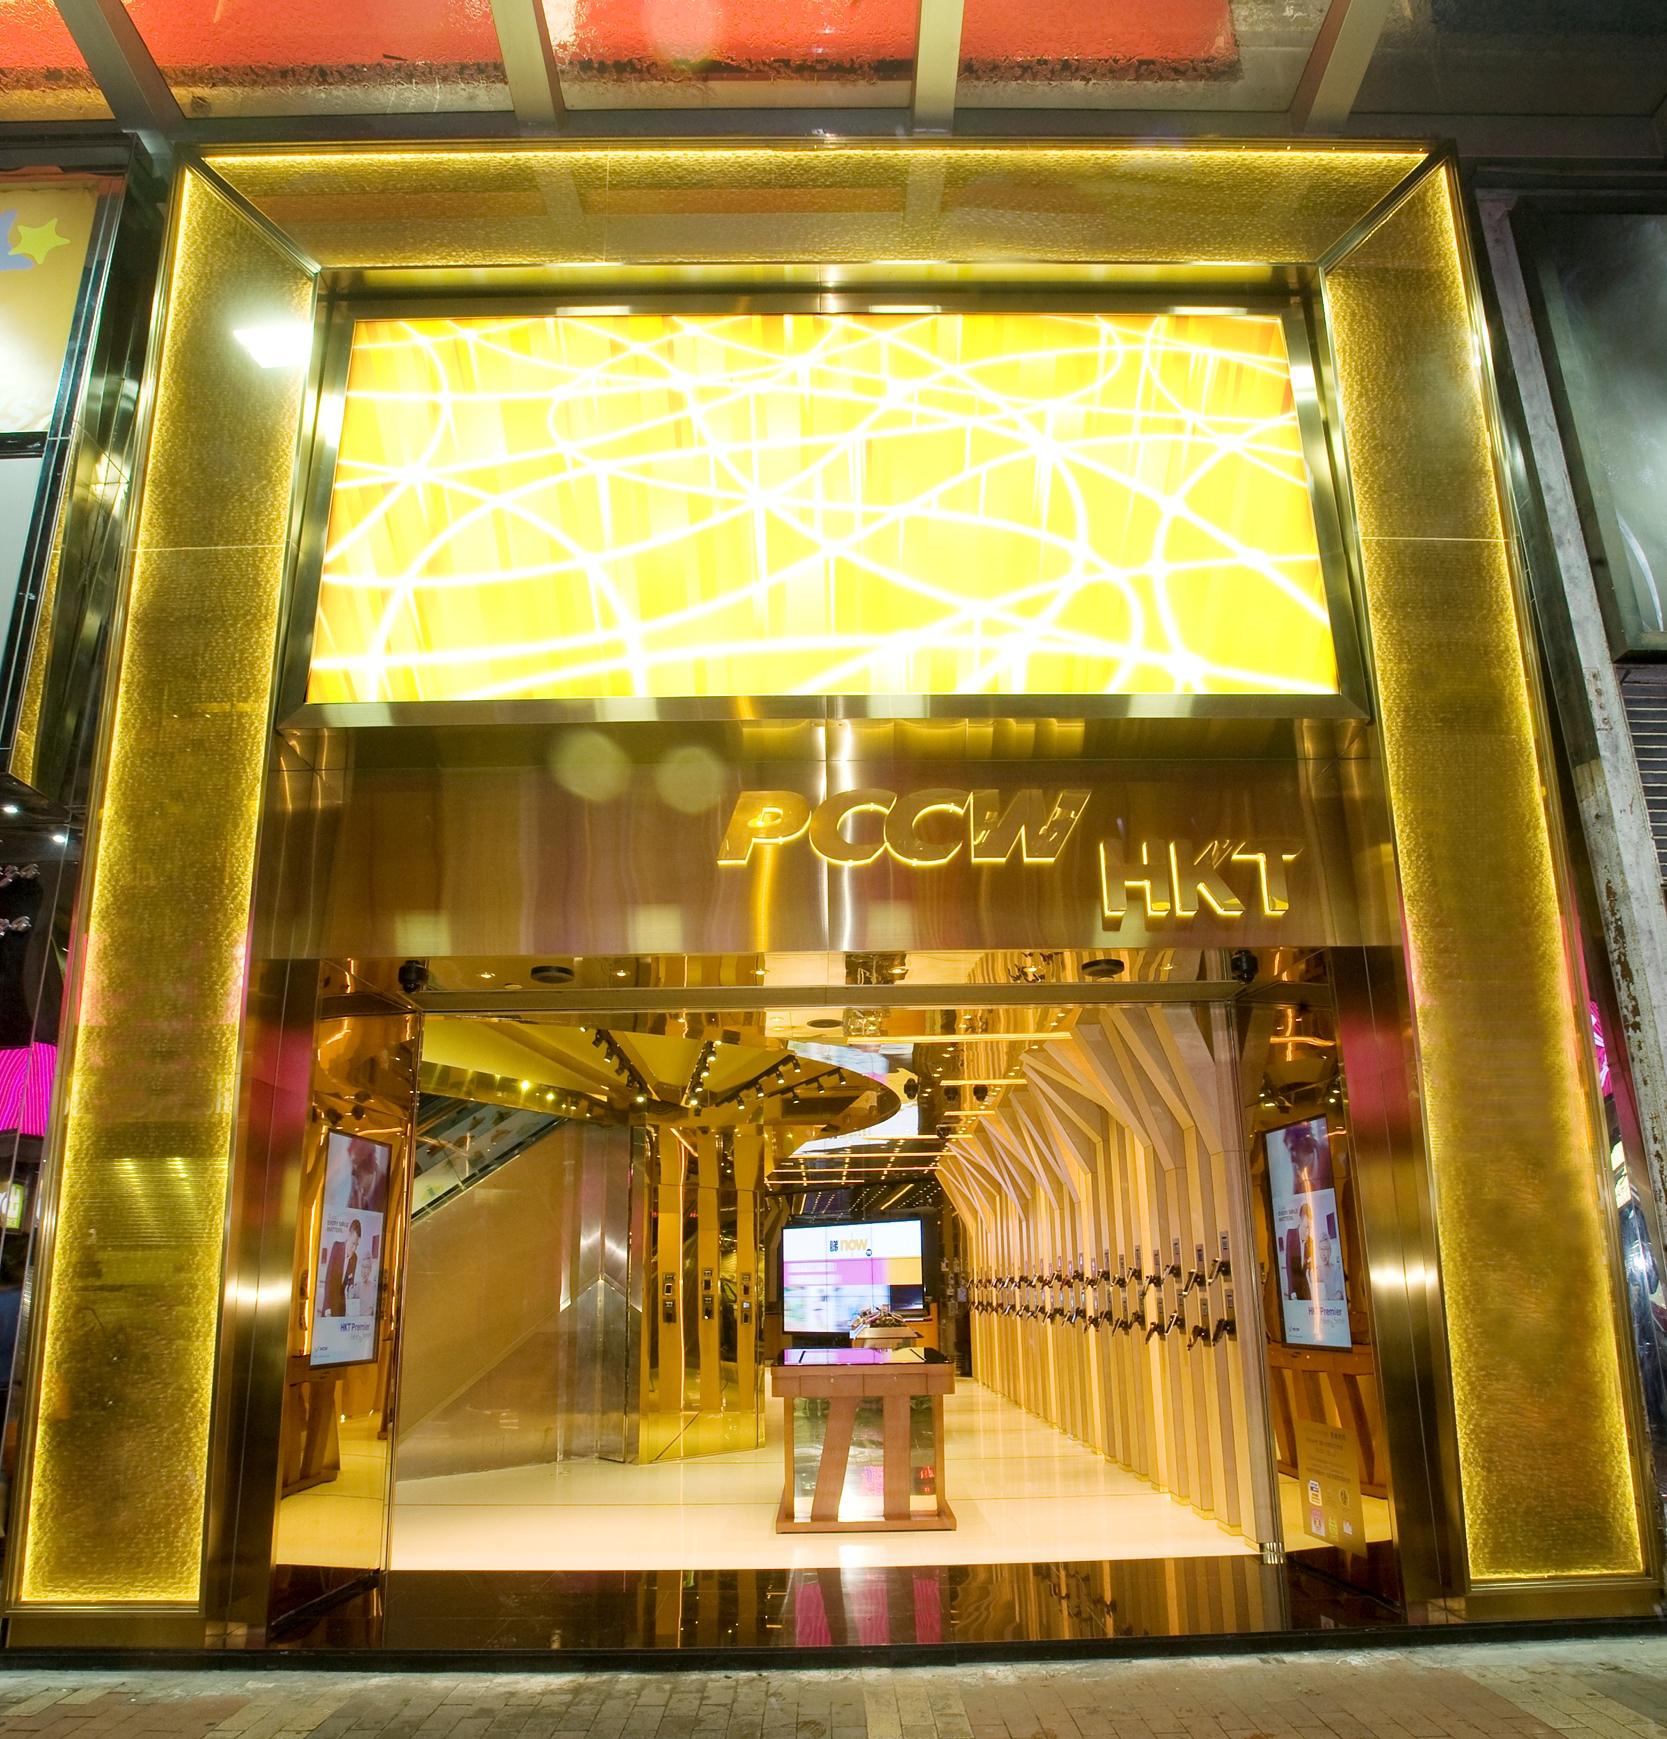 PCCW-HKT Flagship Store Mong Kok